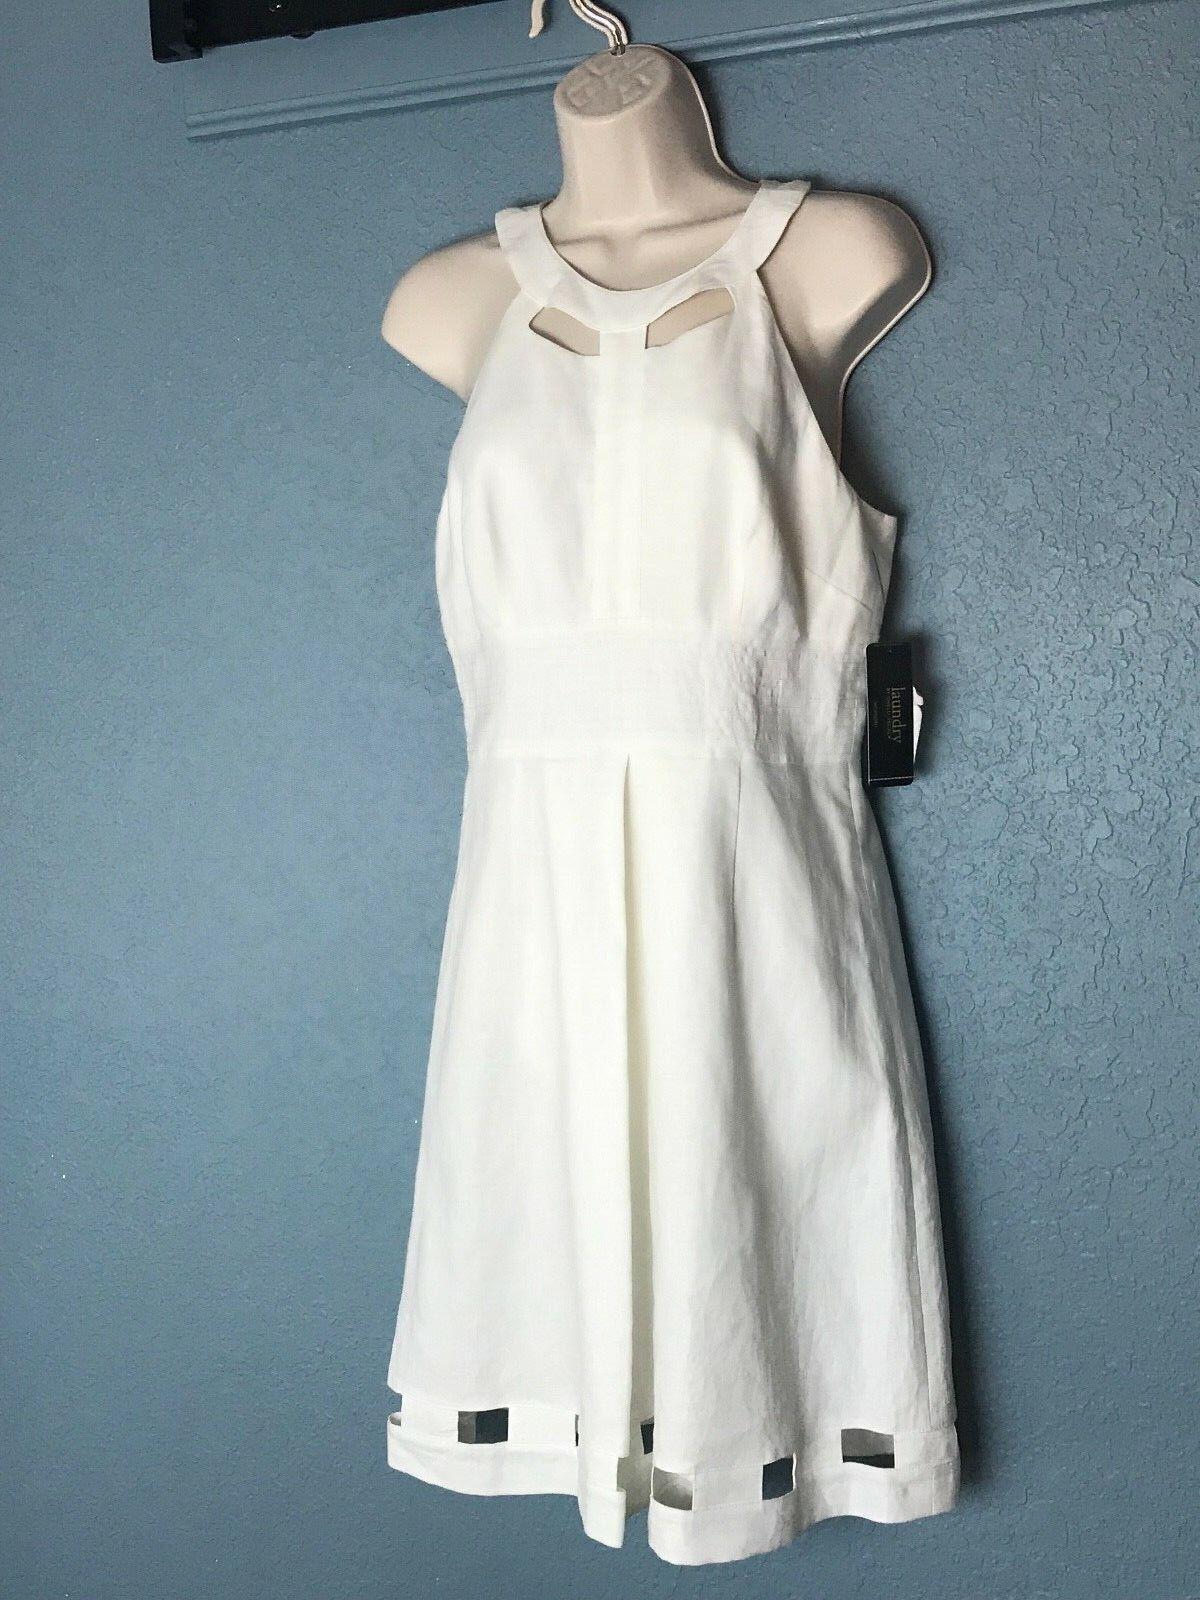 Laundry by Shelli Segal white sleeveless dress NWT size 4